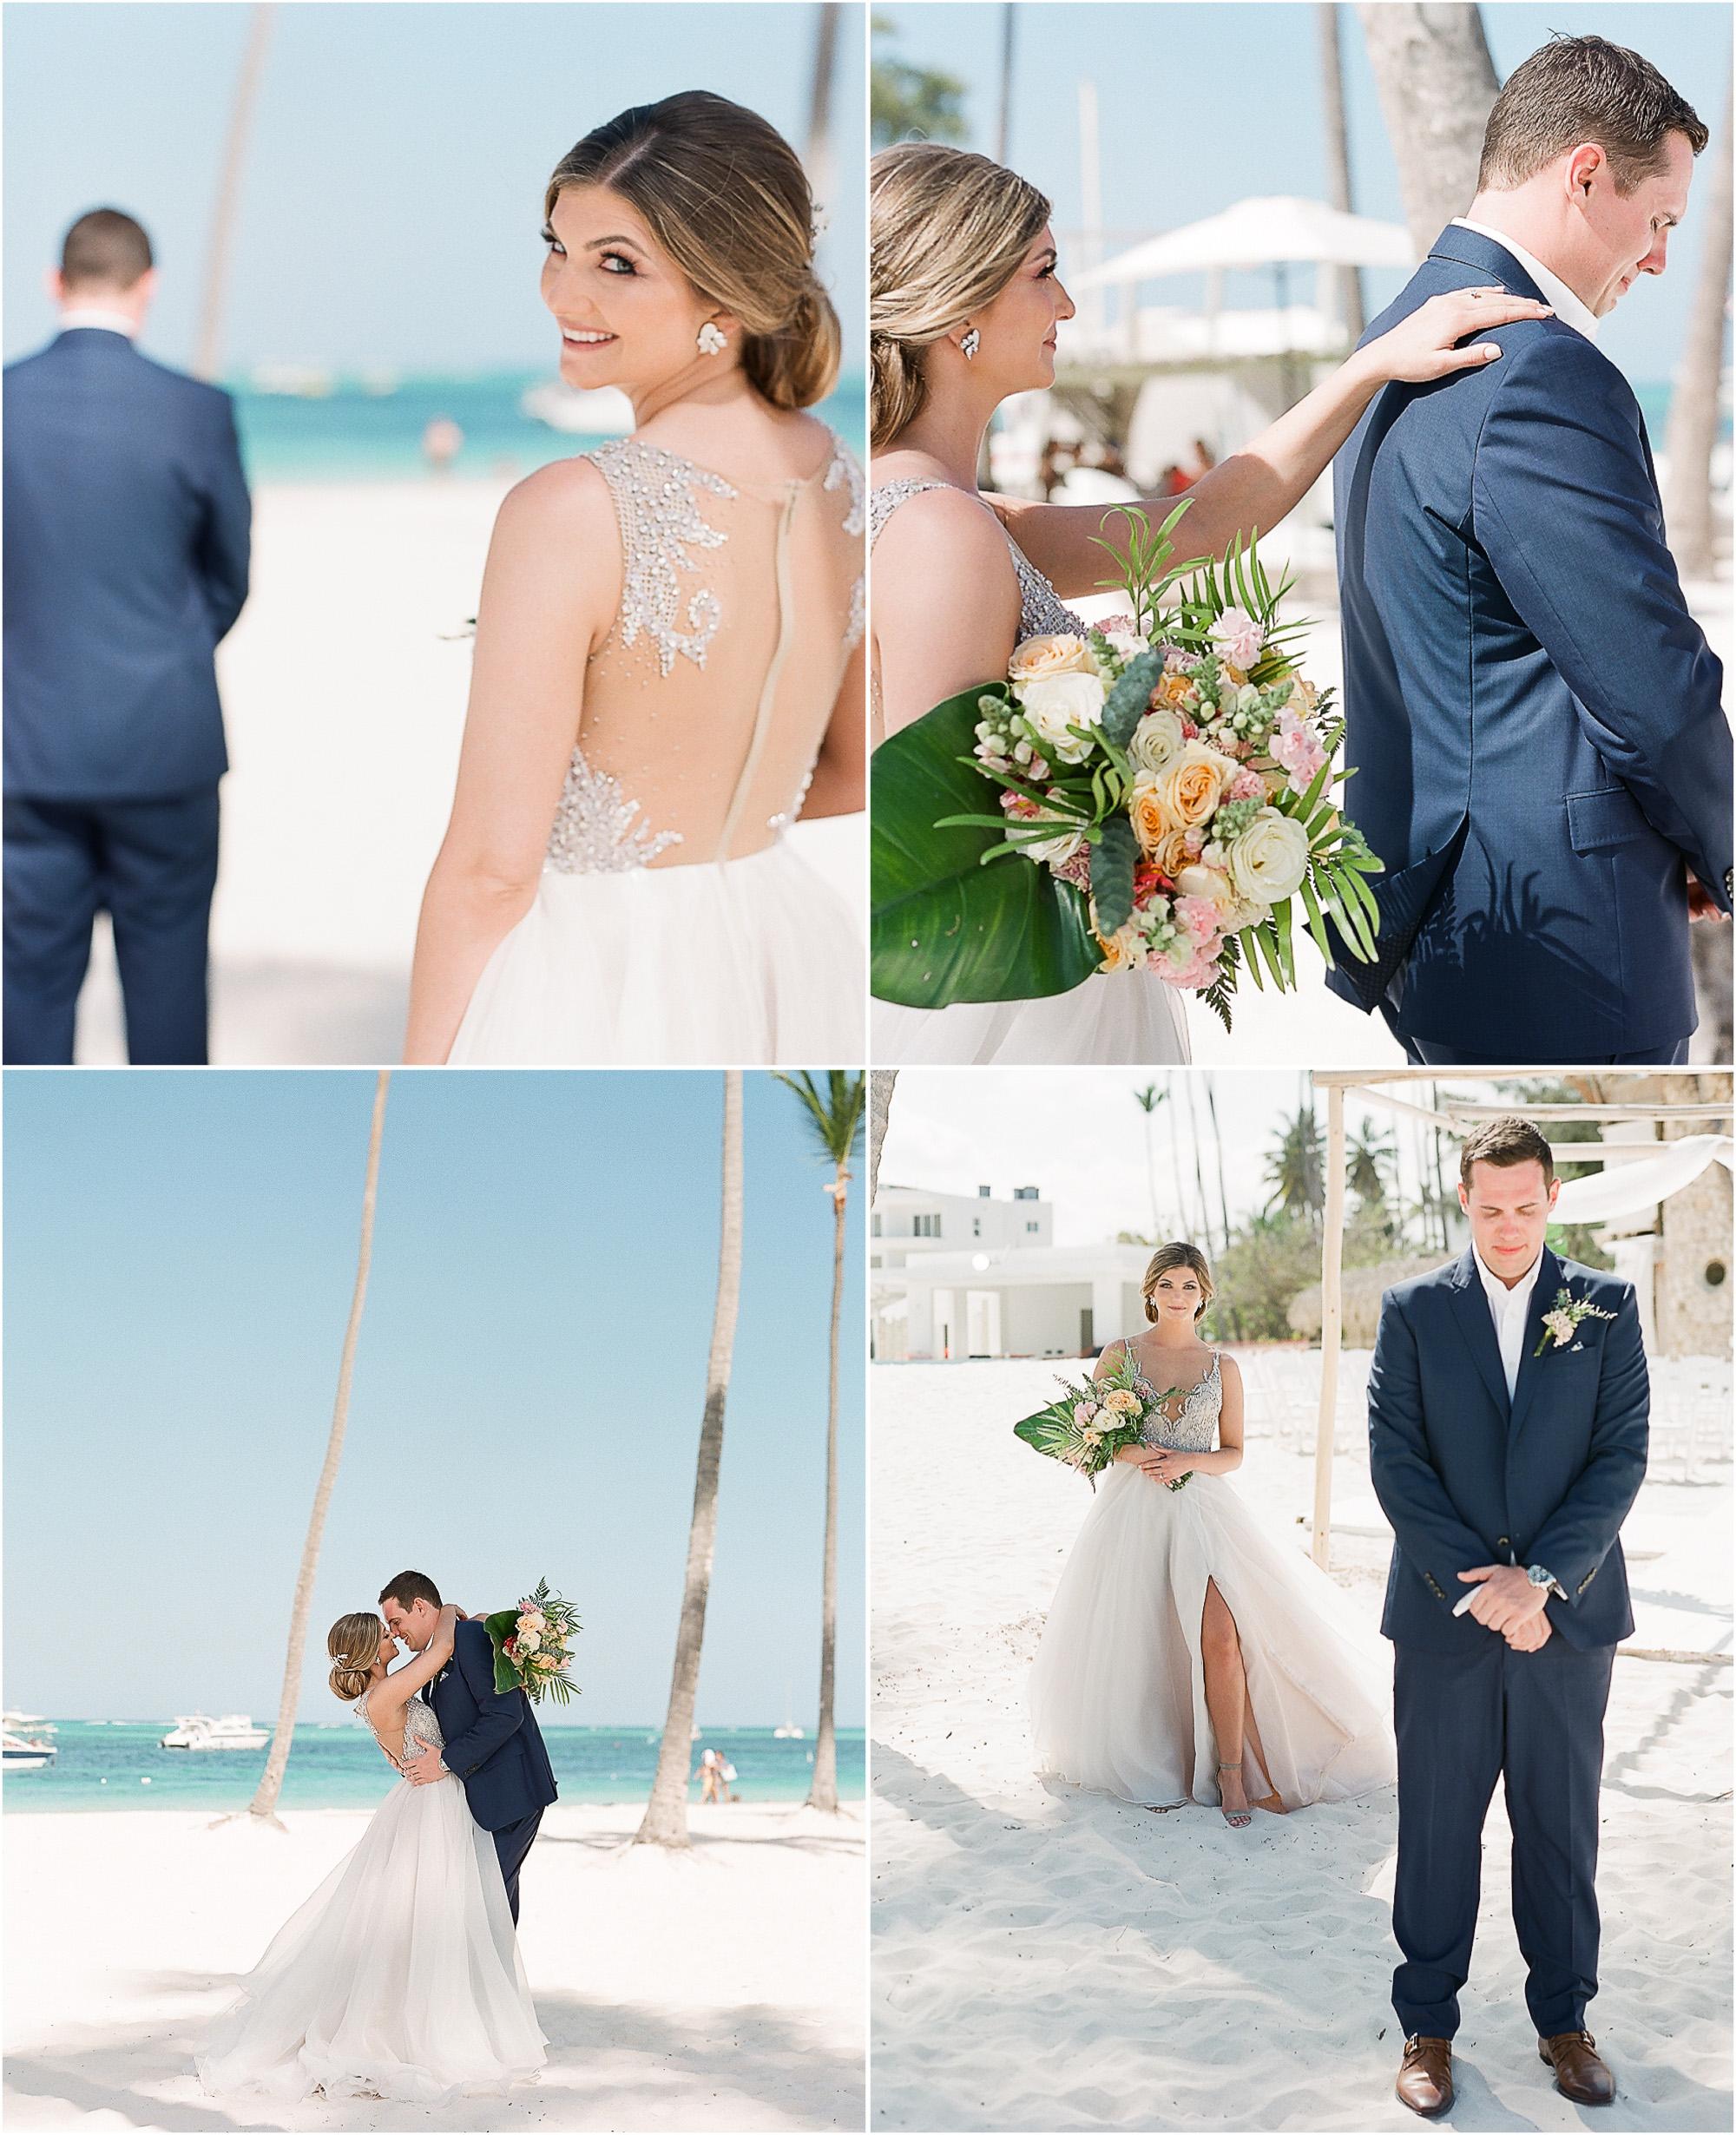 Bonphotage Chicago and Destination Fine Art Wedding Photography - Punta Cana